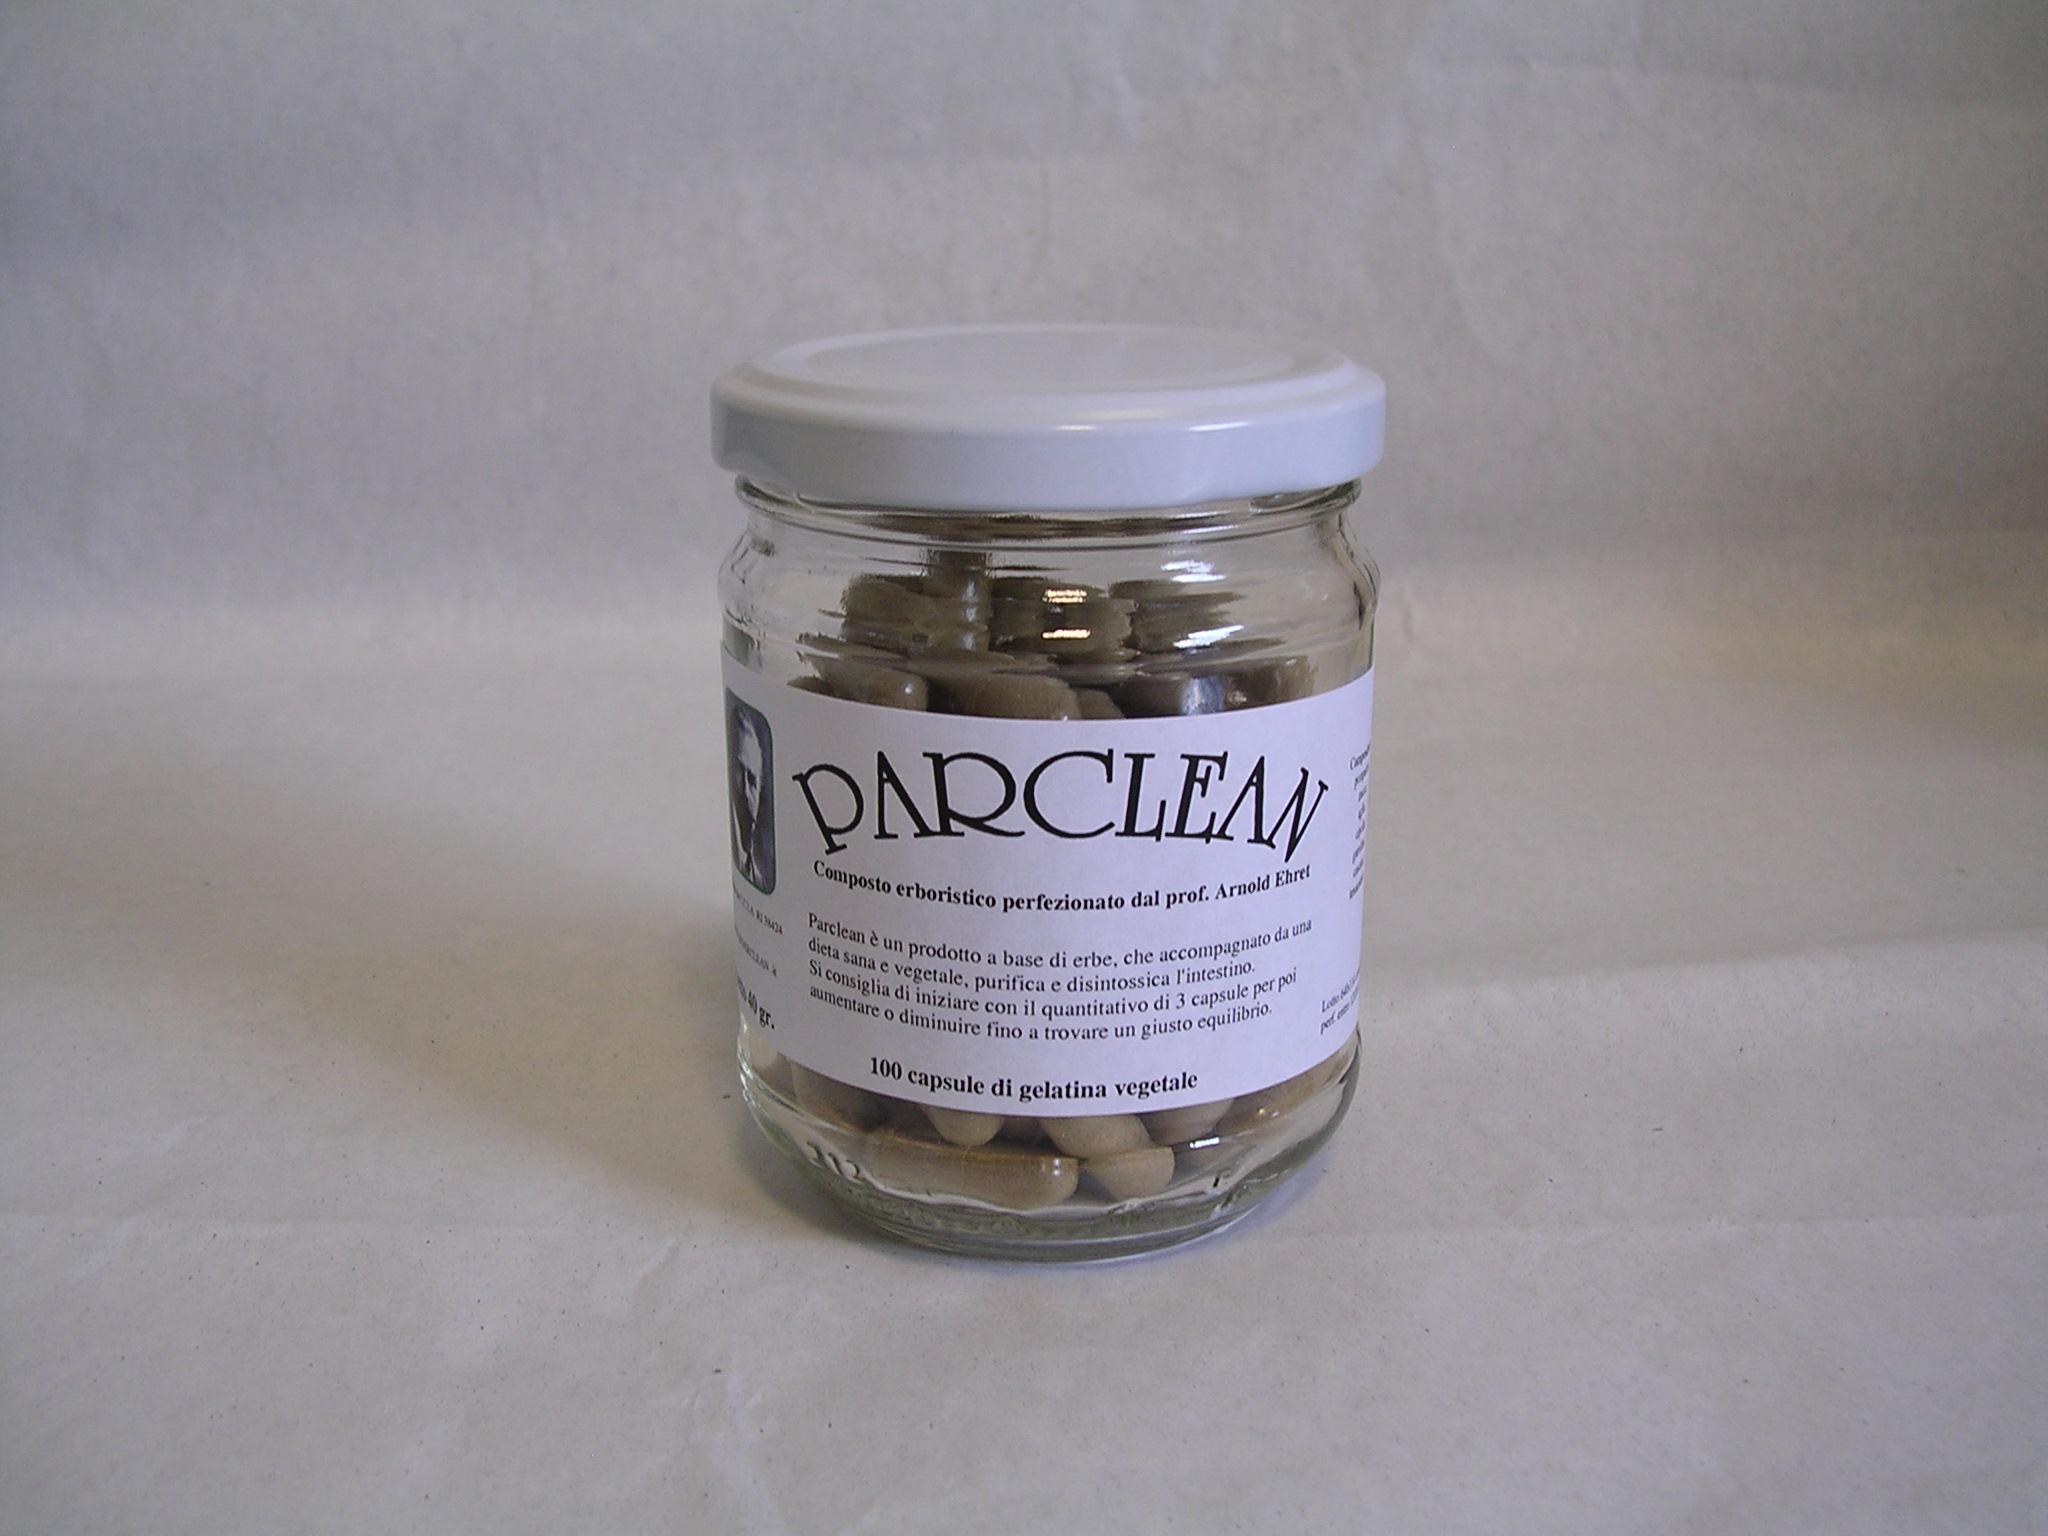 Parclean capsule